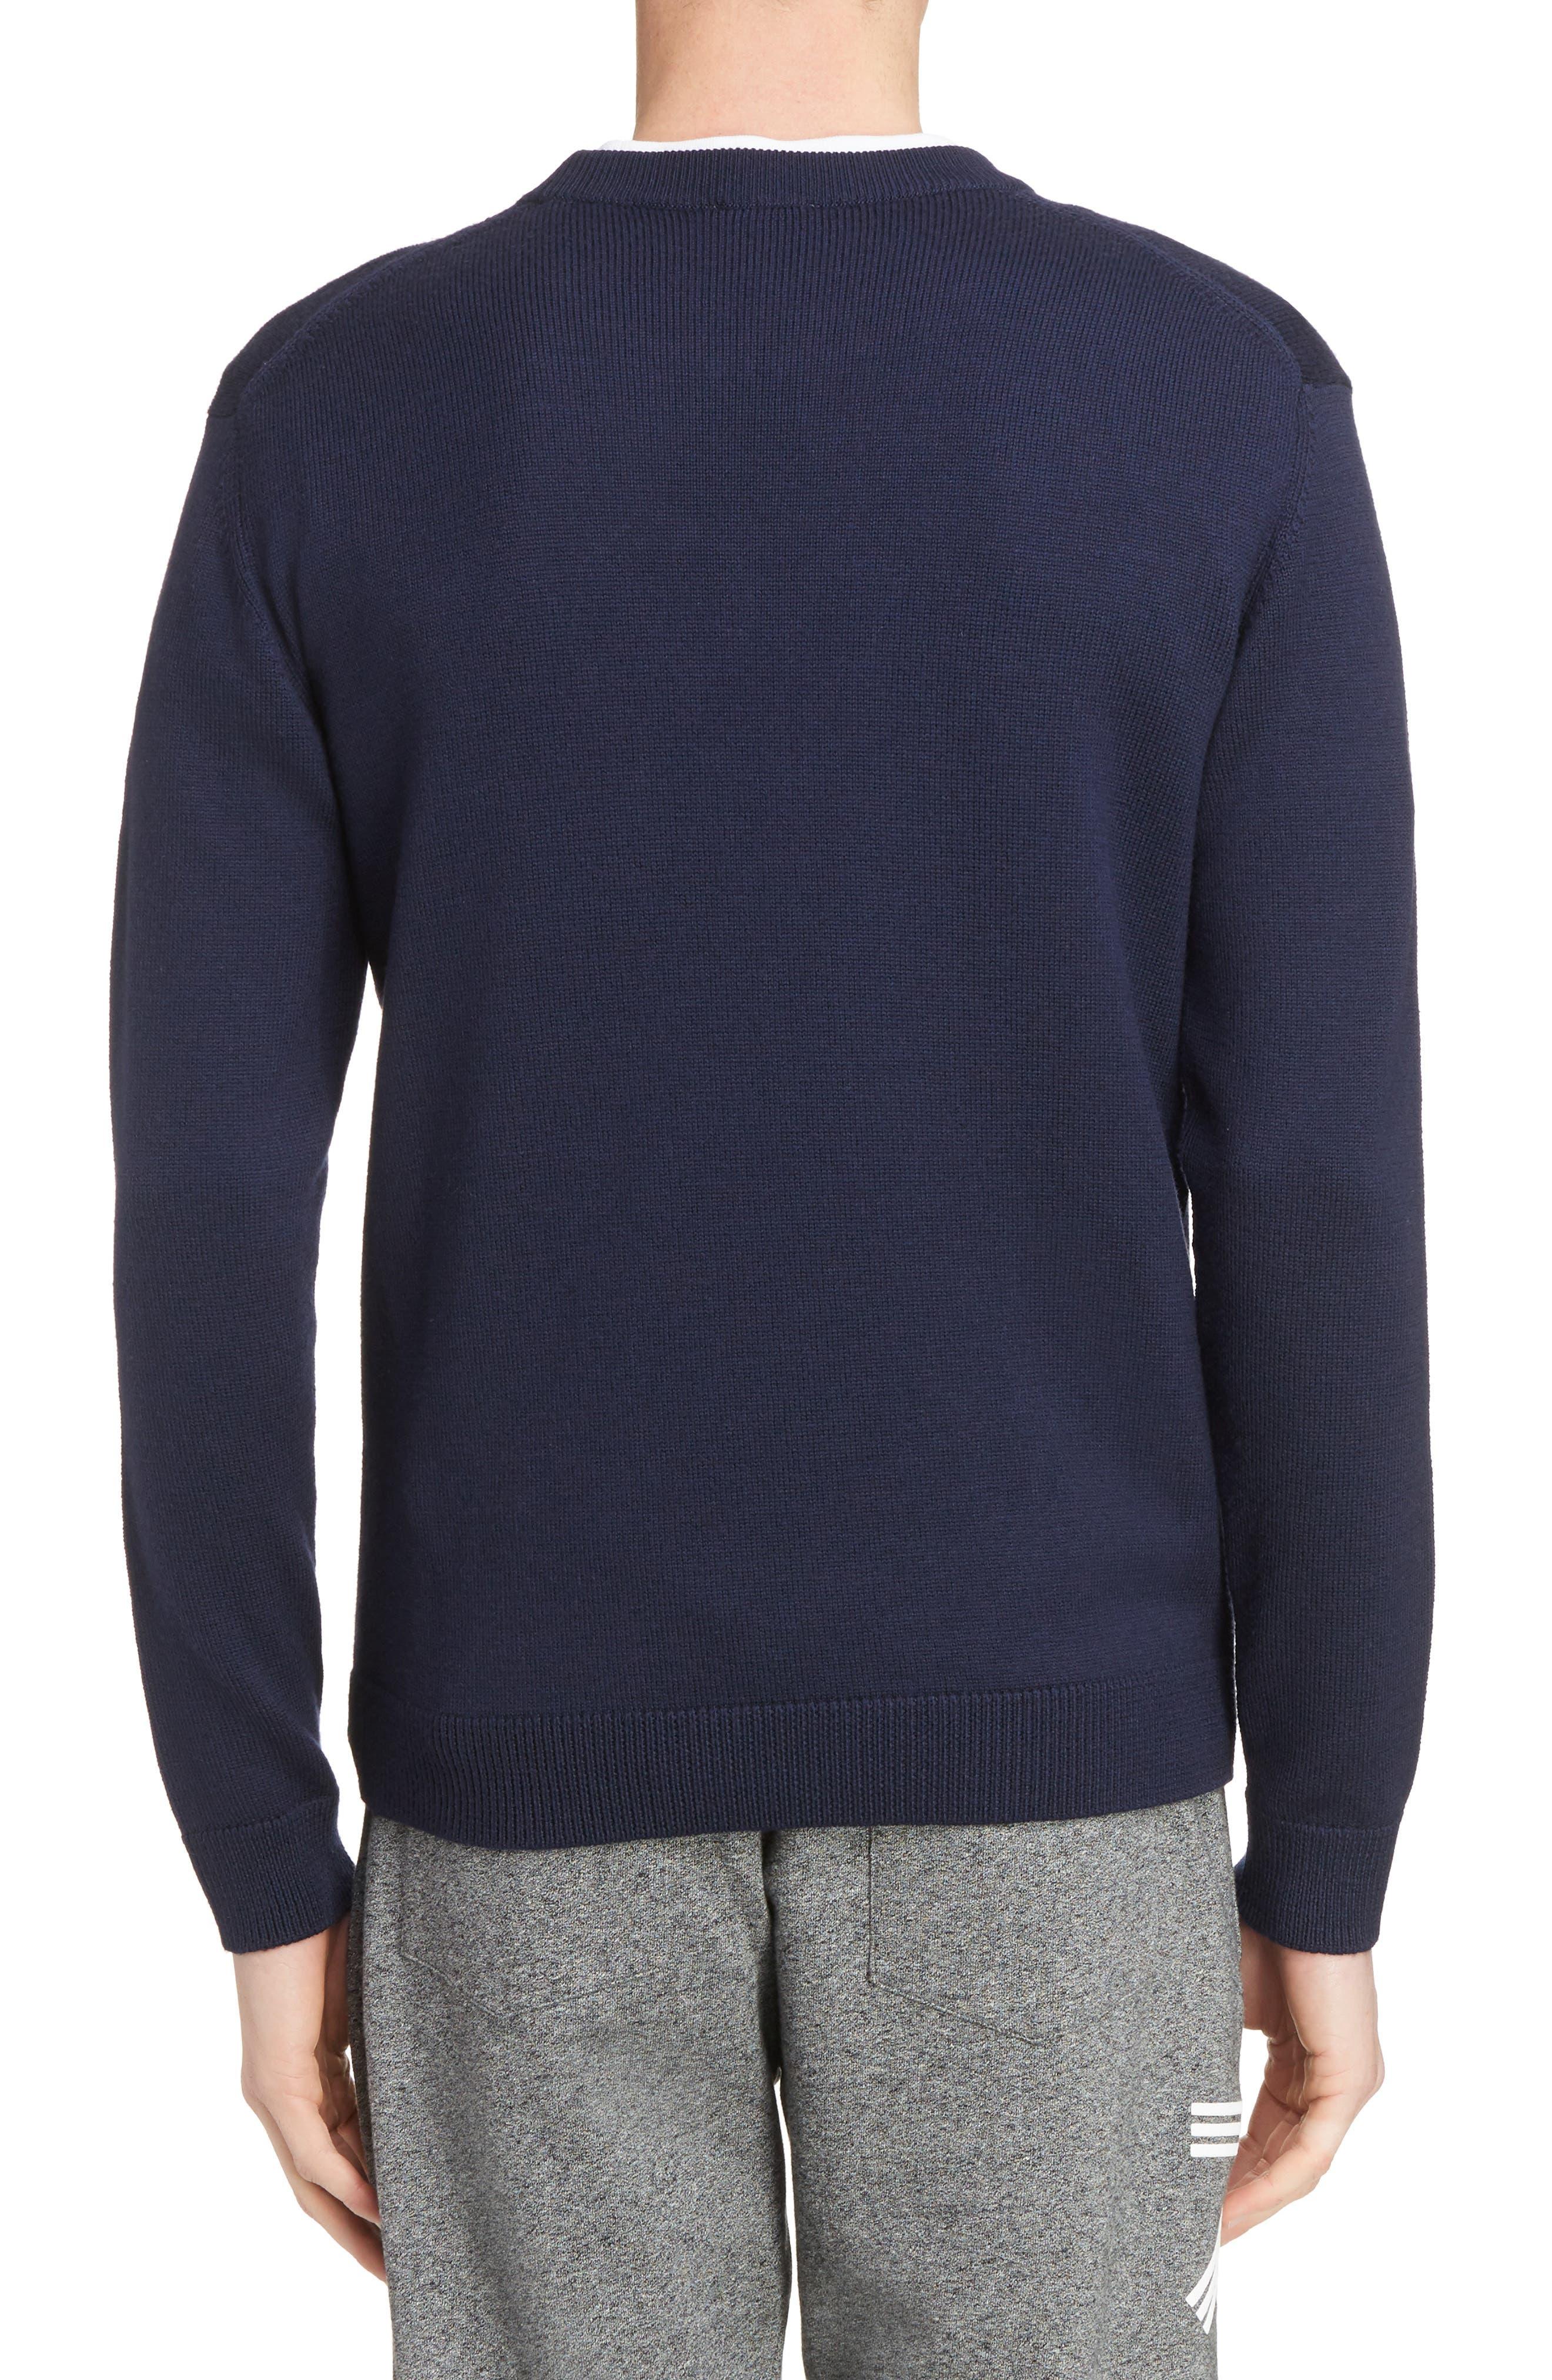 Cotton Pullover,                             Alternate thumbnail 2, color,                             421